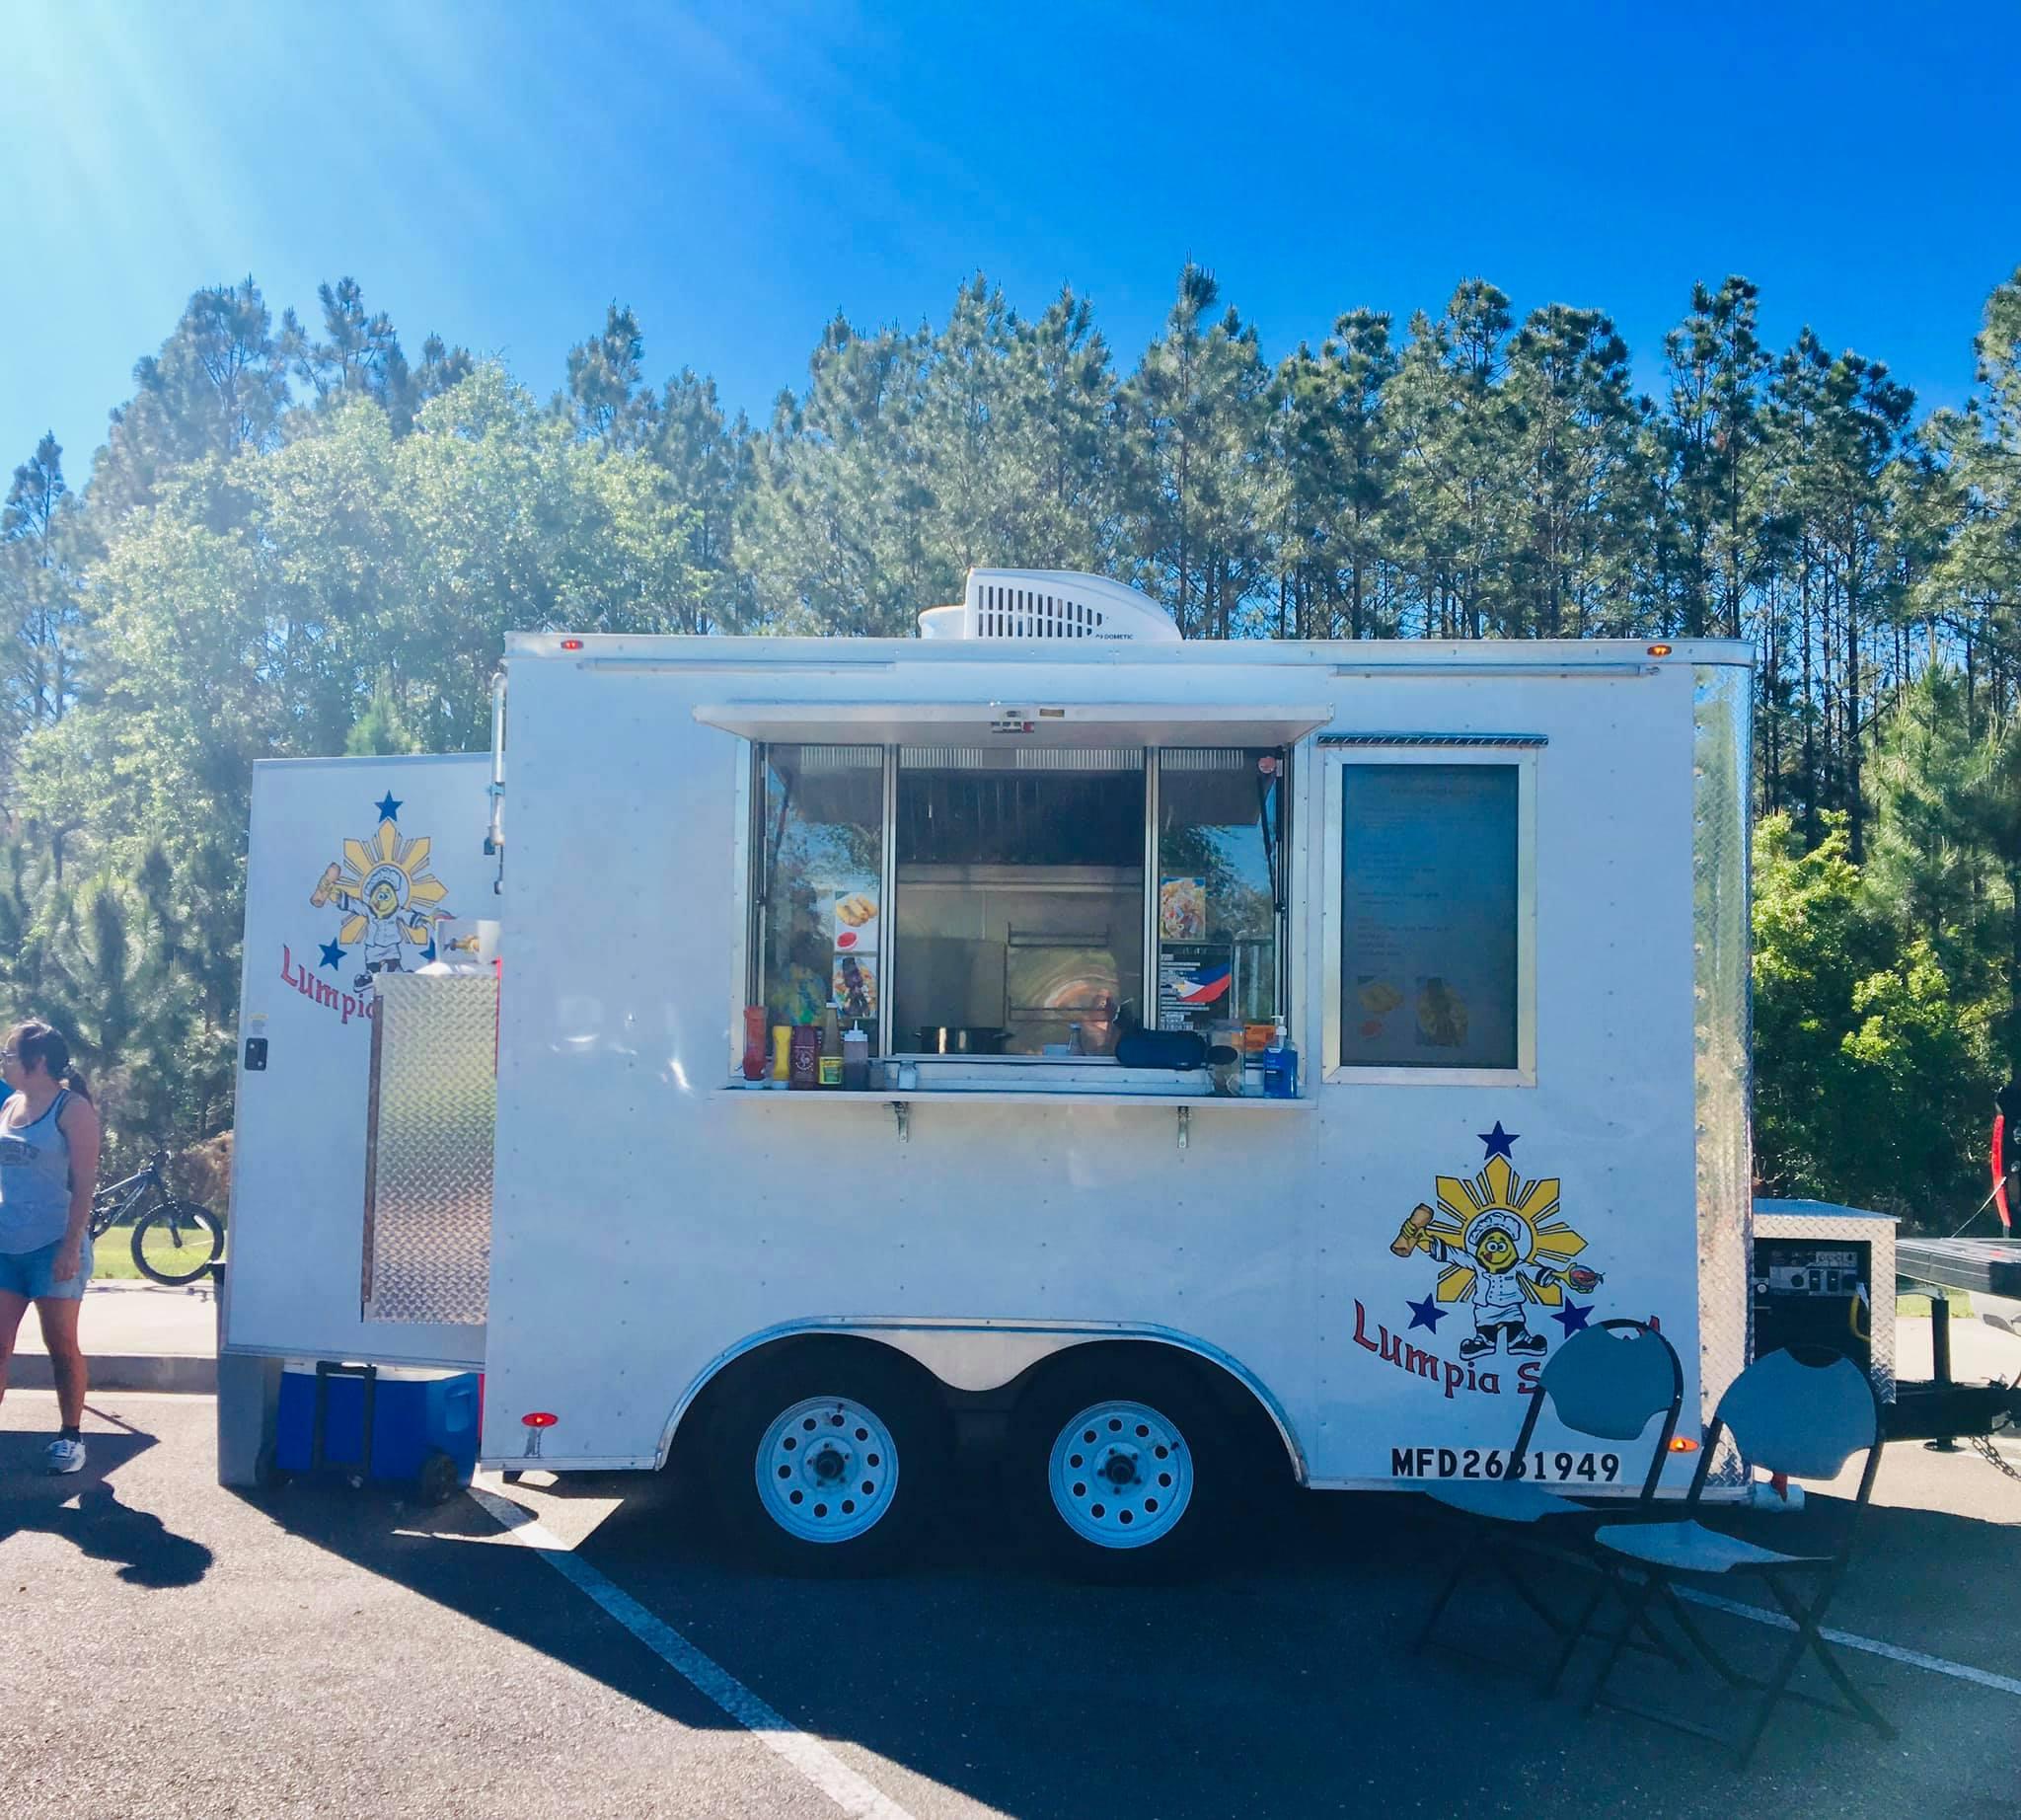 Lumpia Station Food Truck